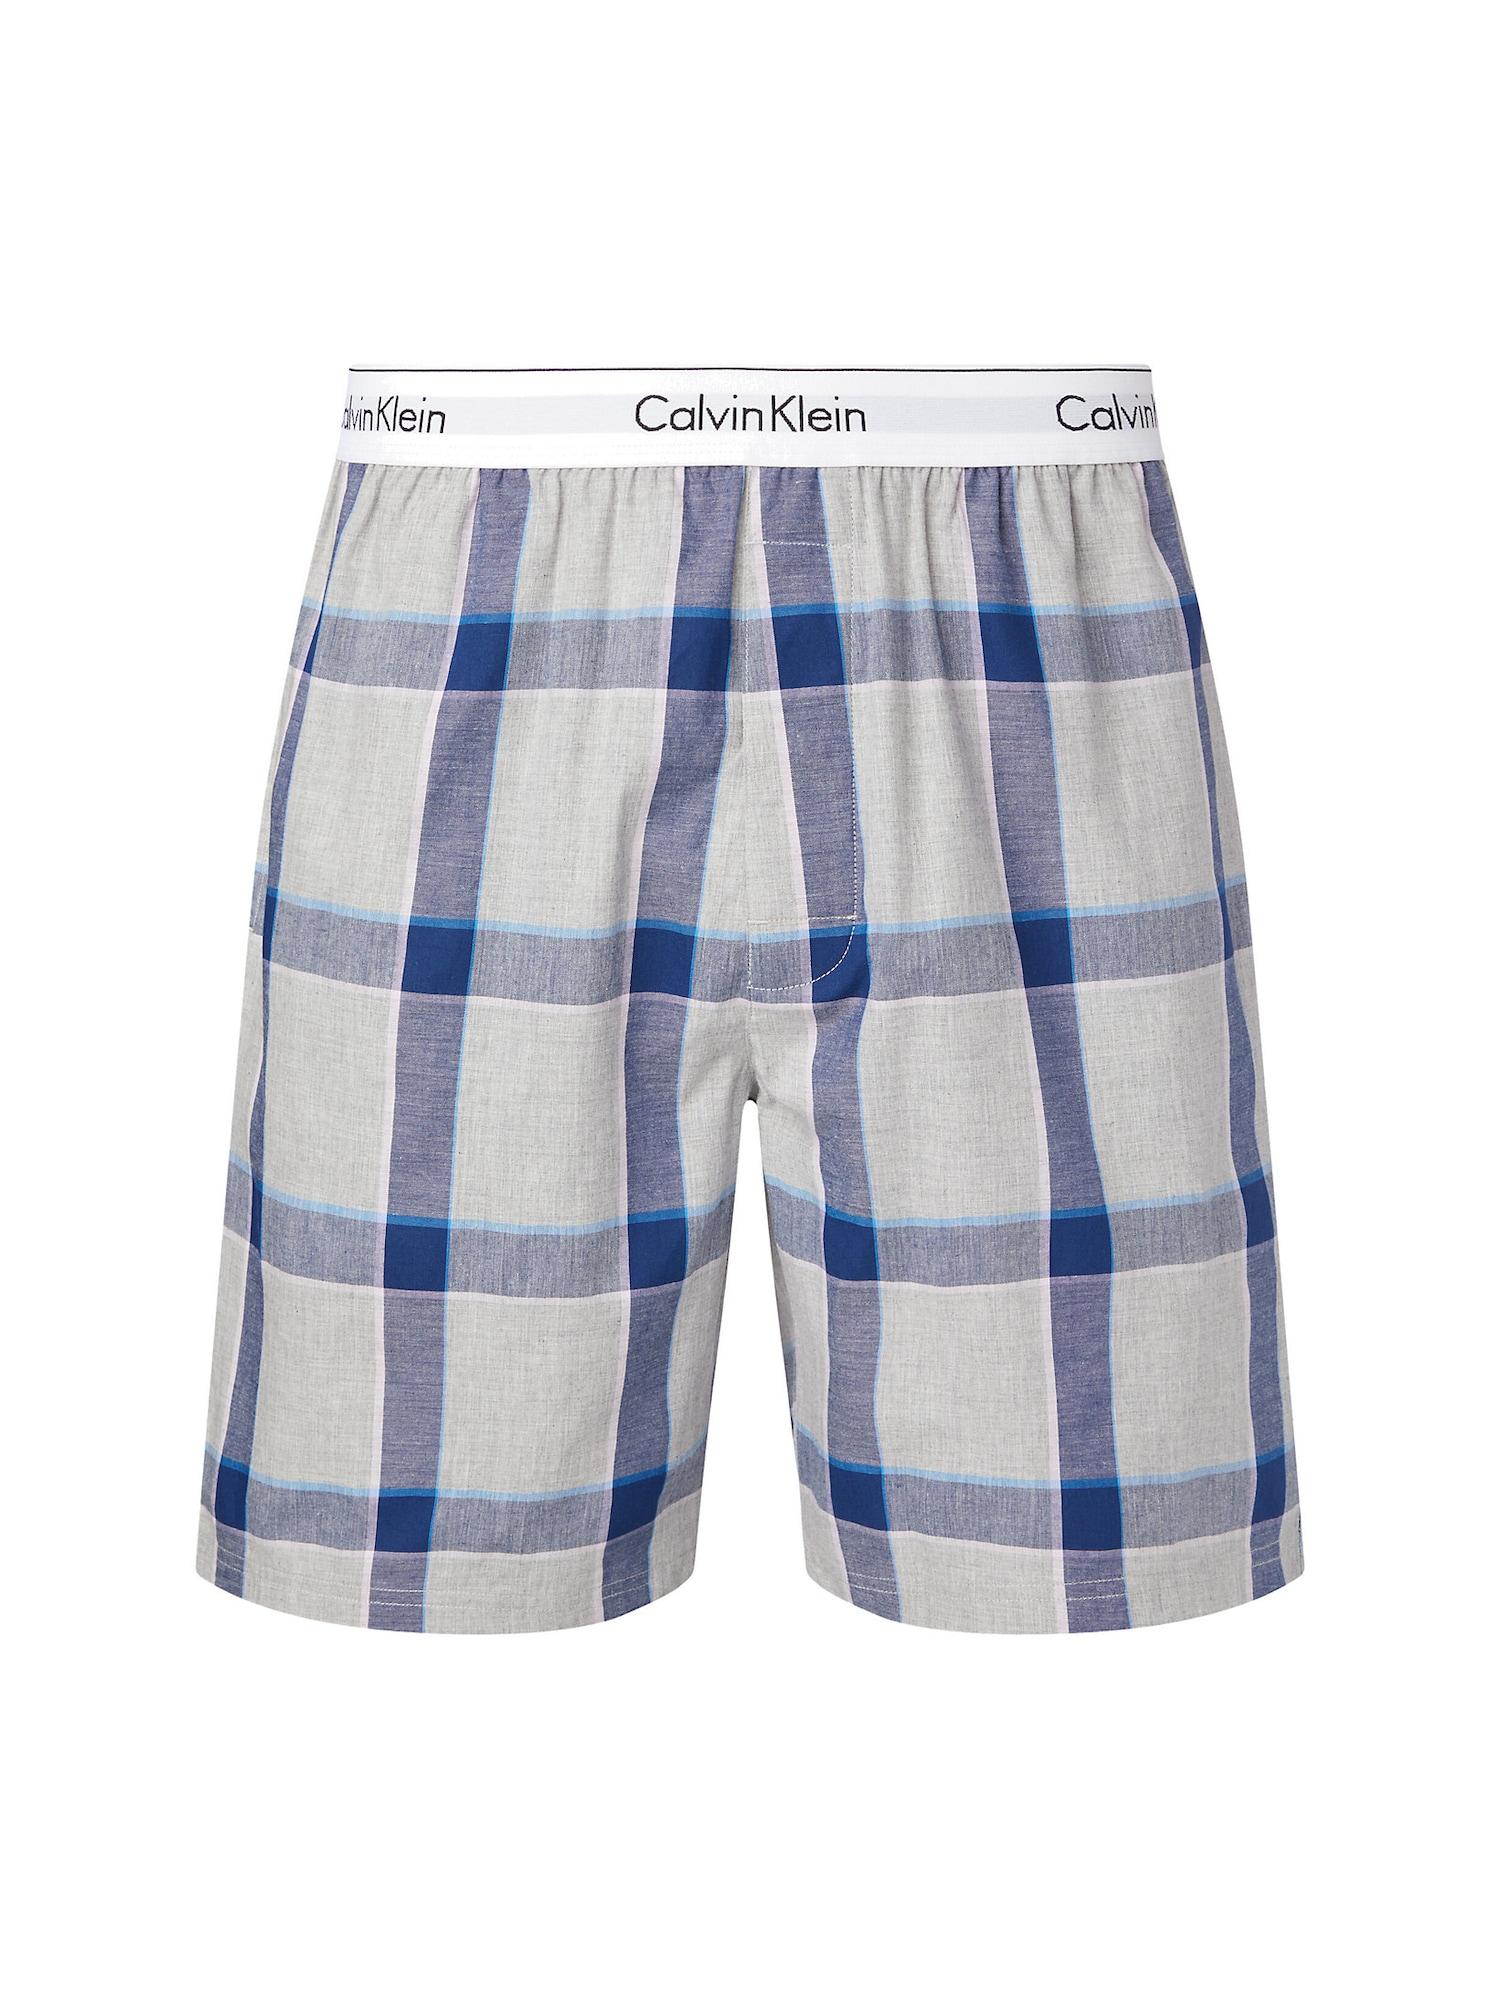 Calvin Klein Underwear Pyžamové kalhoty  šedá / chladná modrá / modrá / světlemodrá